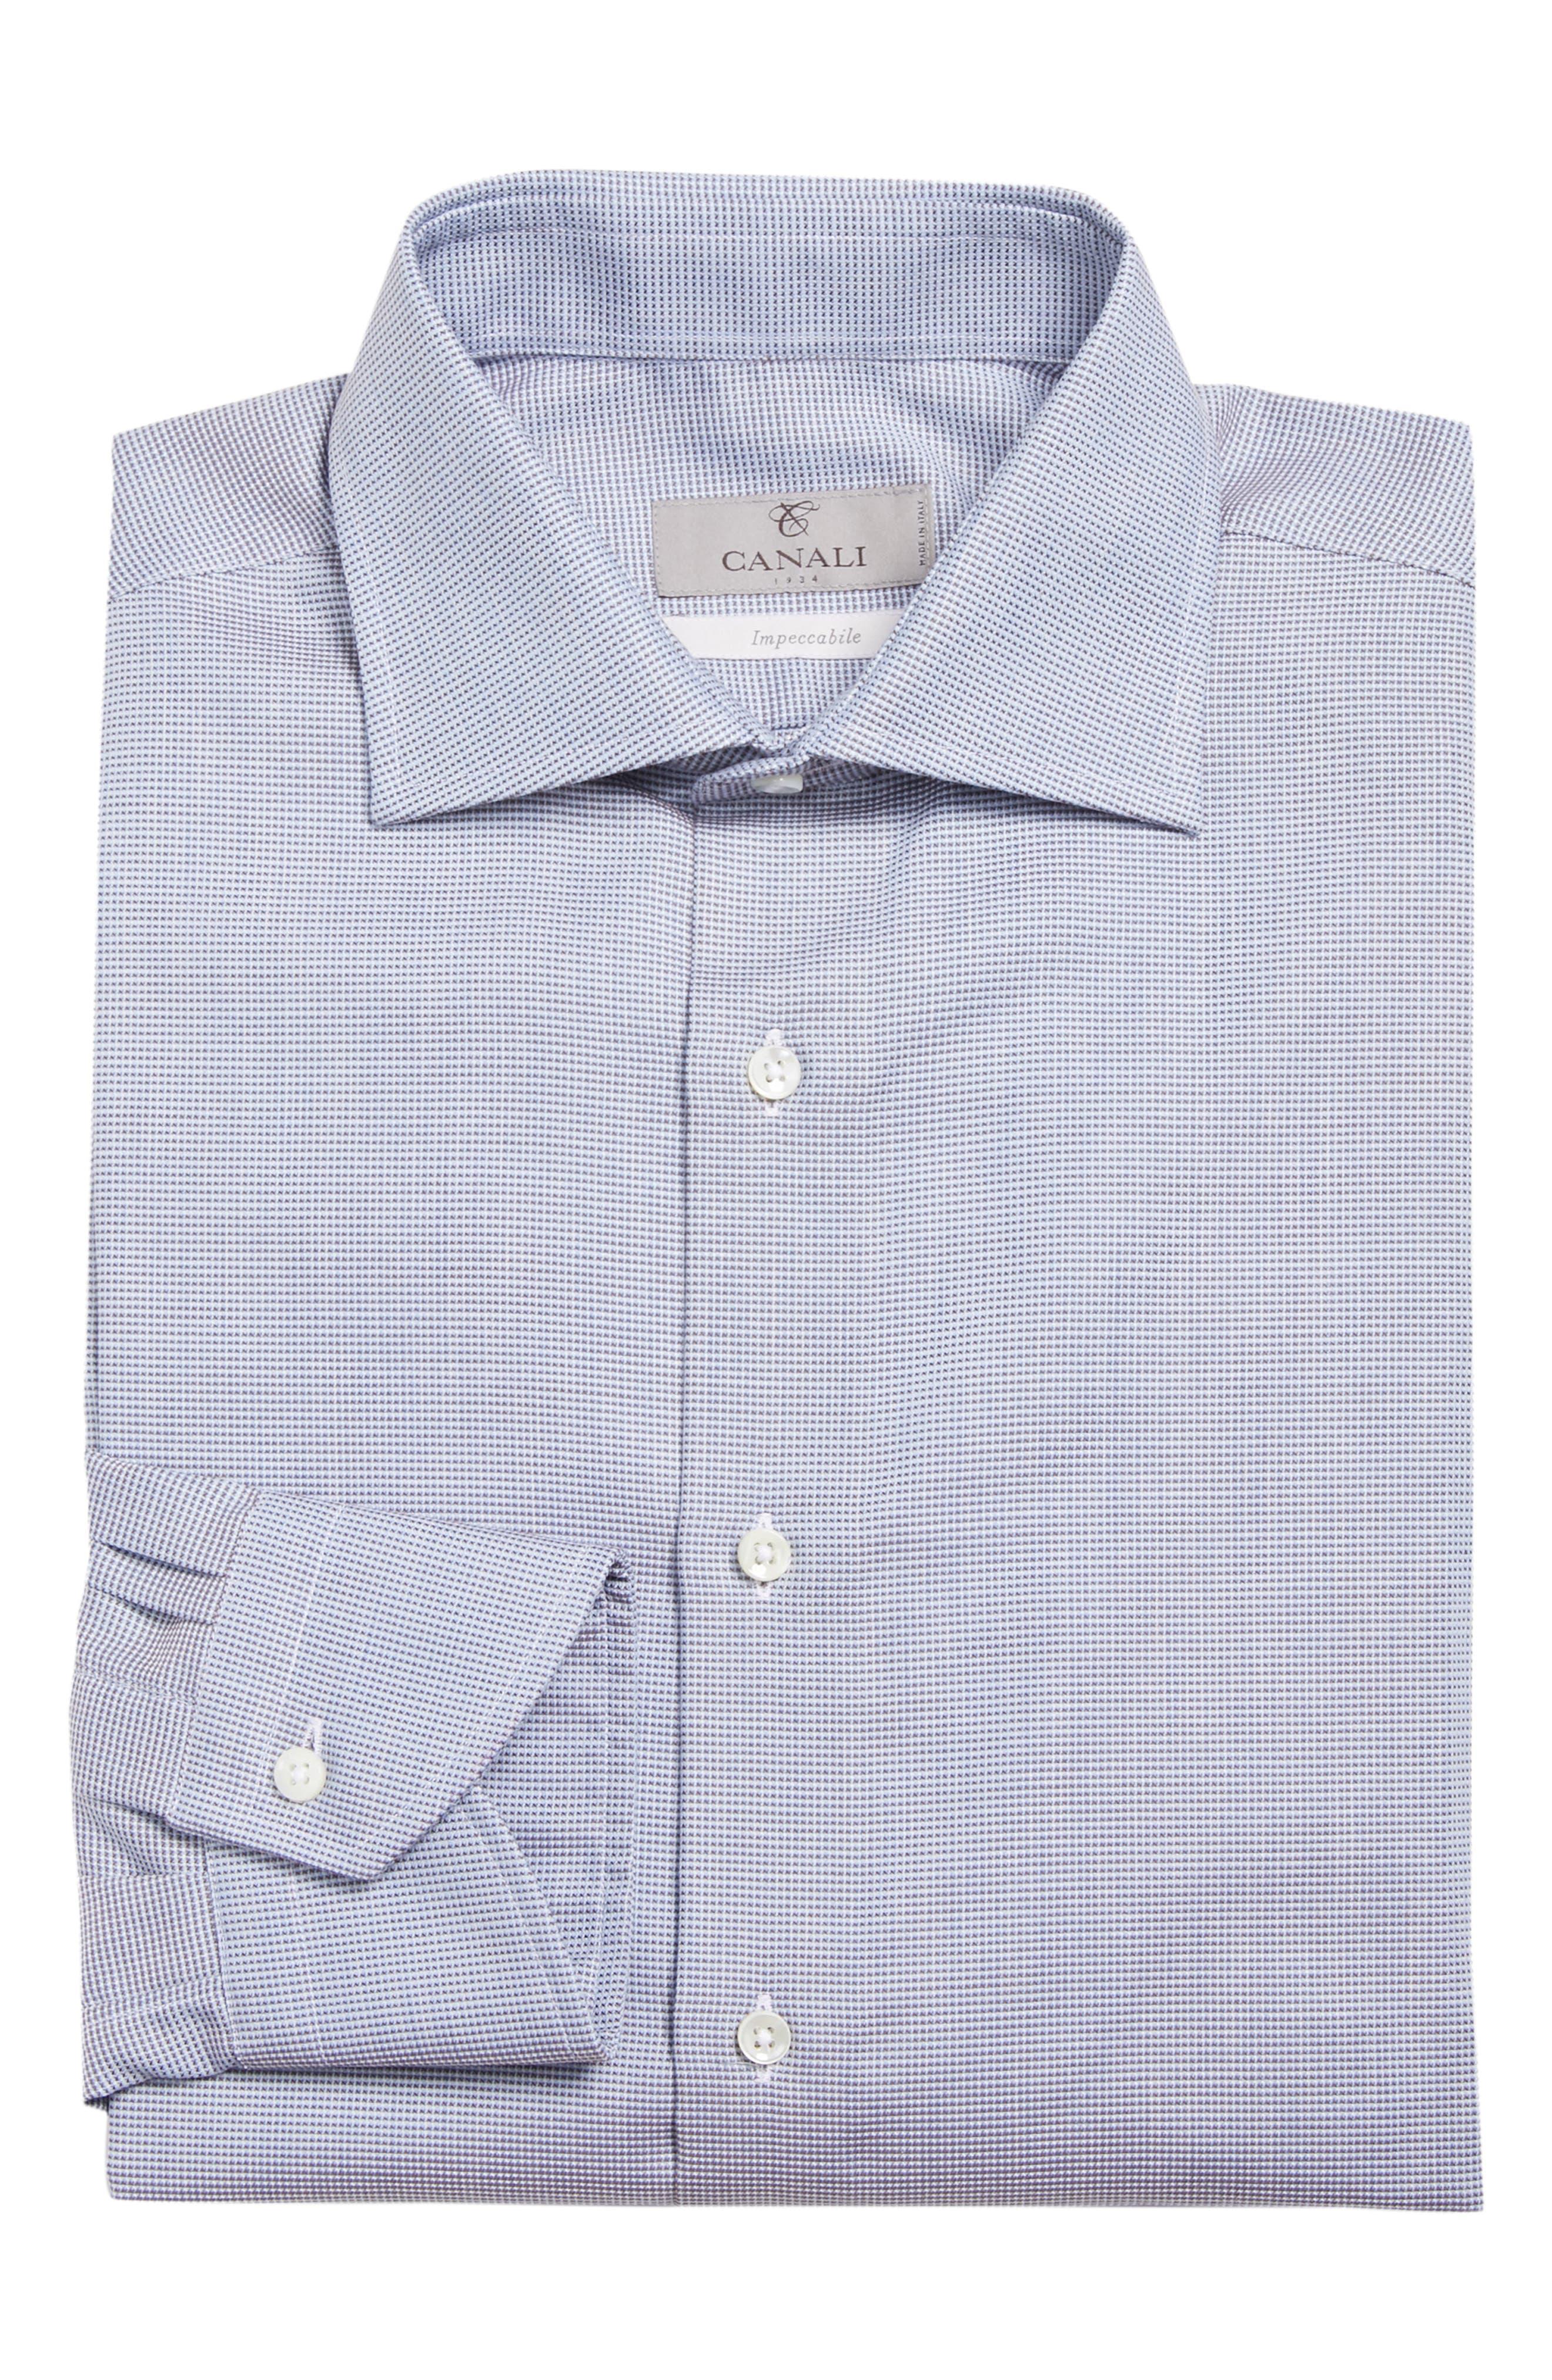 Regular Fit Solid Dress Shirt,                             Alternate thumbnail 5, color,                             200